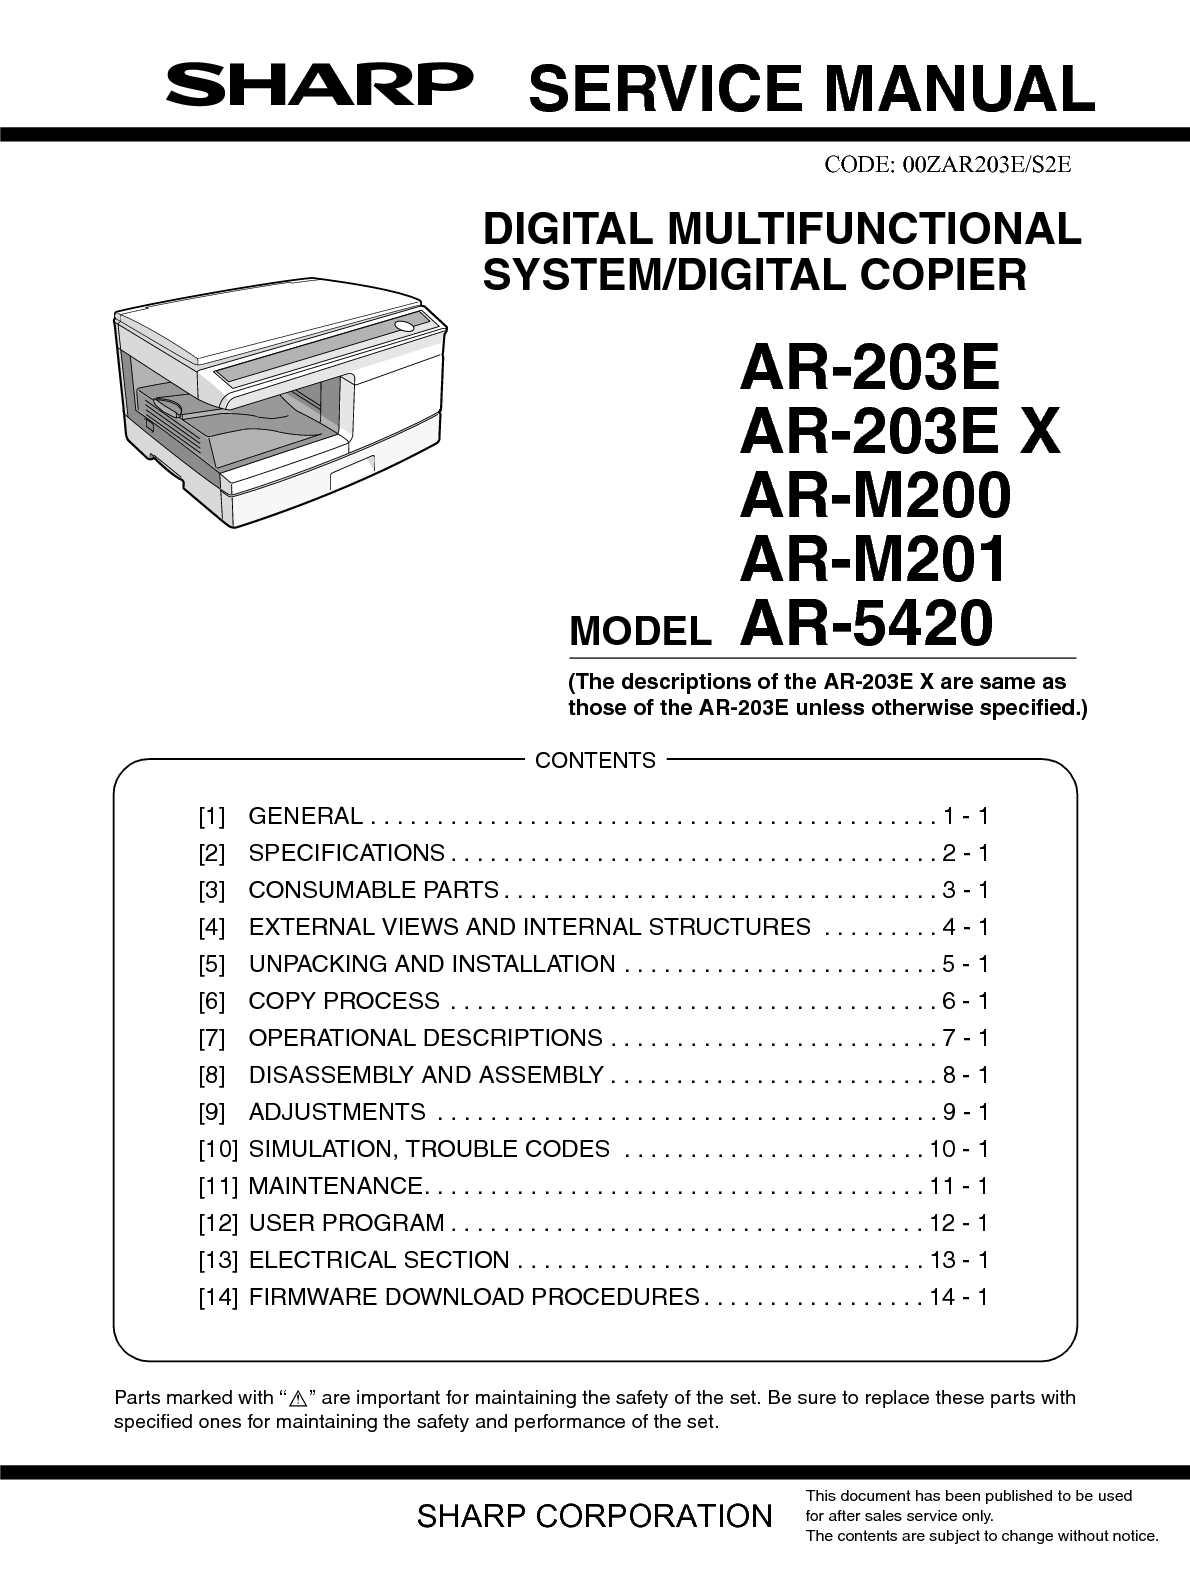 AR-M201 SCANNER WINDOWS DRIVER DOWNLOAD